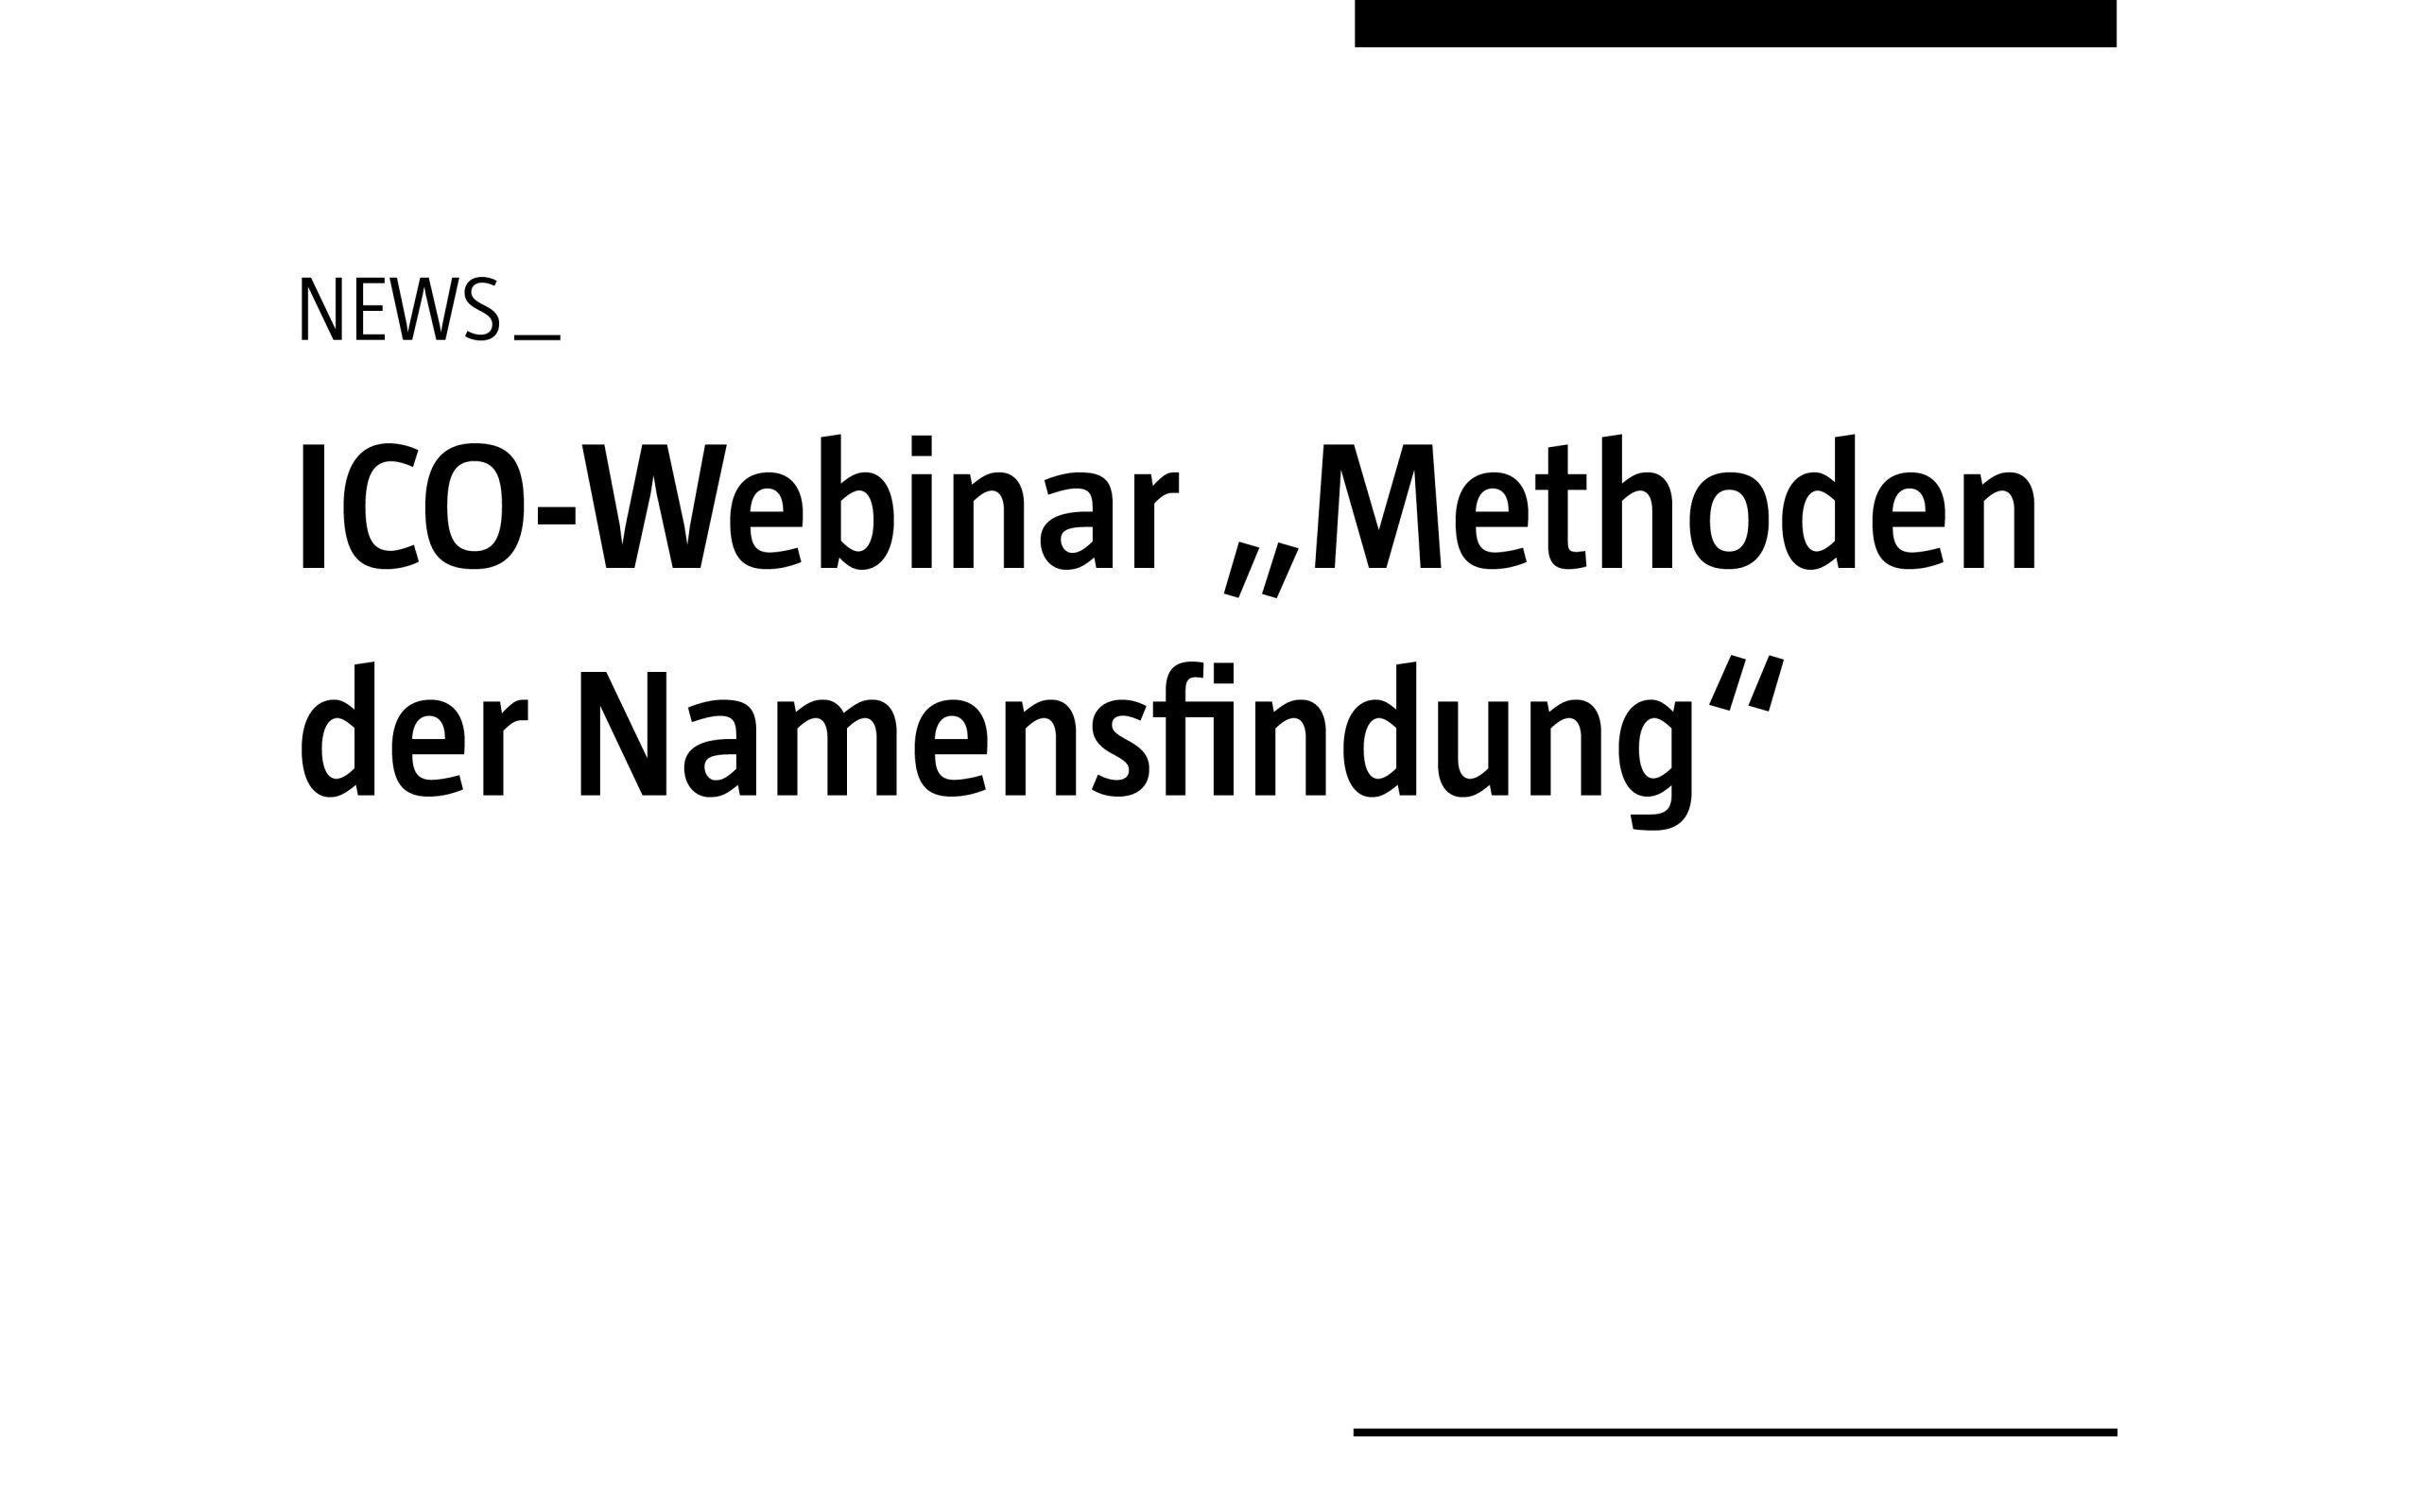 stay golden, naming, namensfindung, webinar, osnabrück, innovationscentrum, wissen